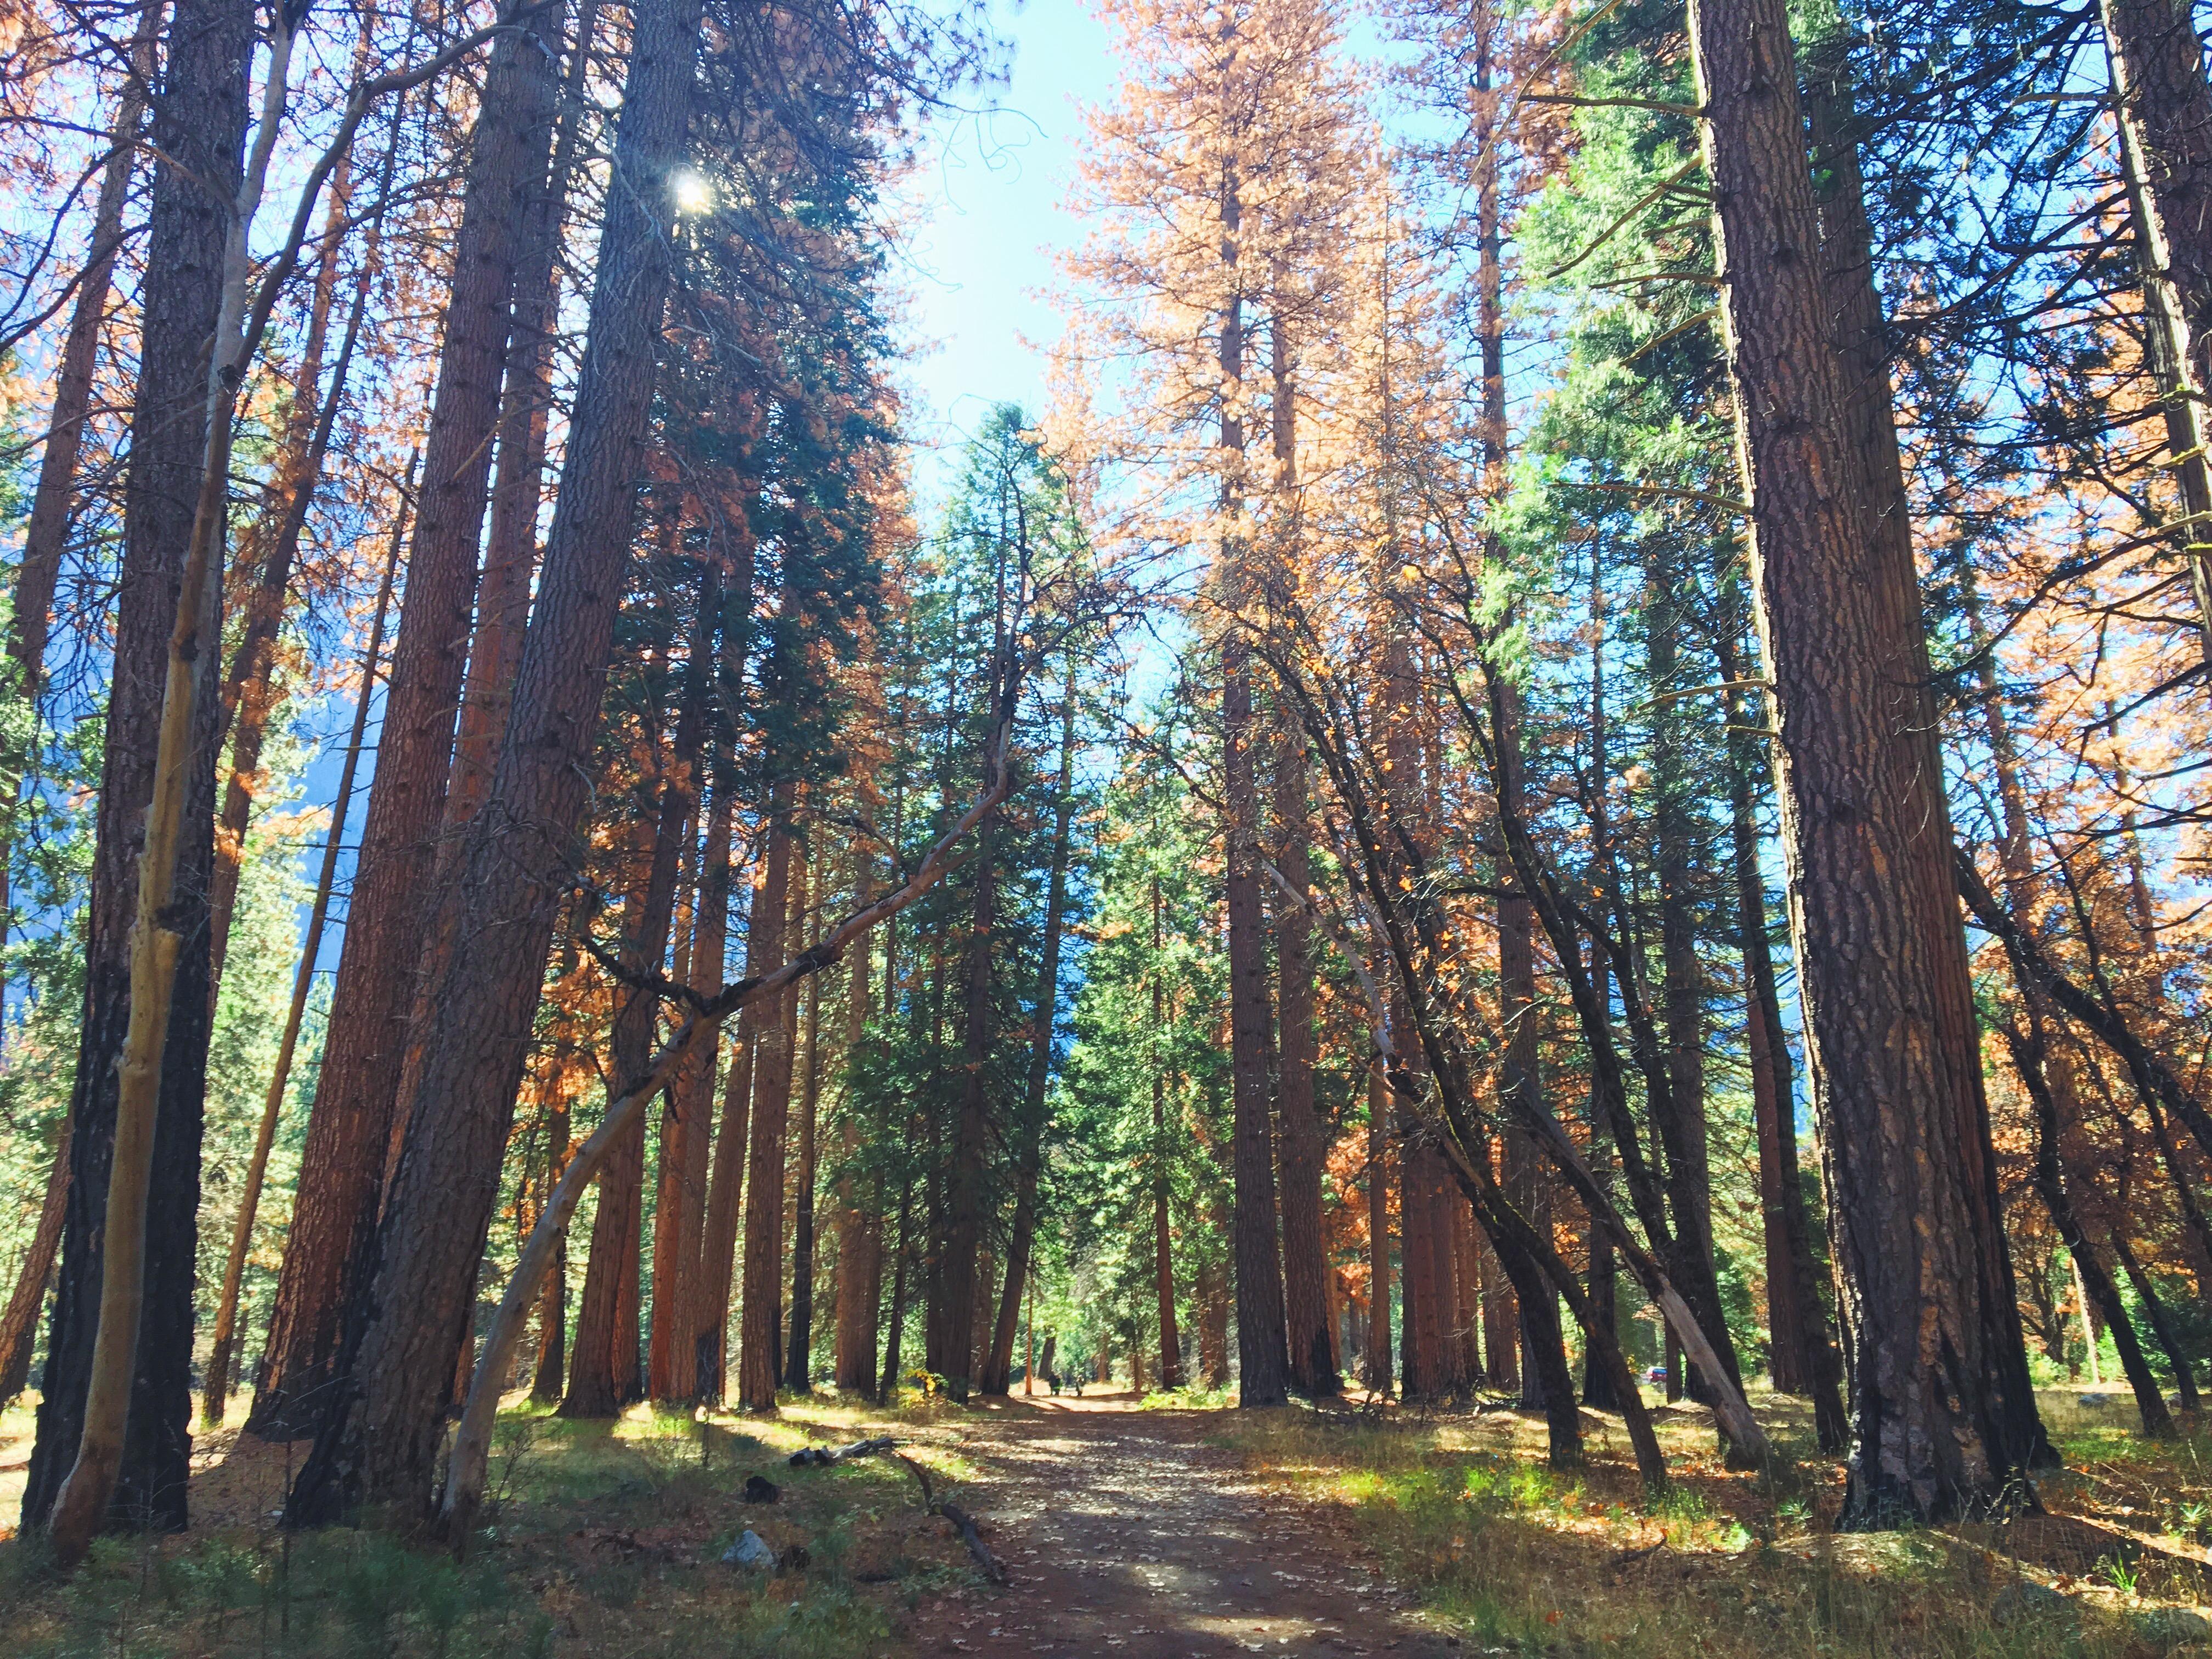 Foresta Yosemite National Park